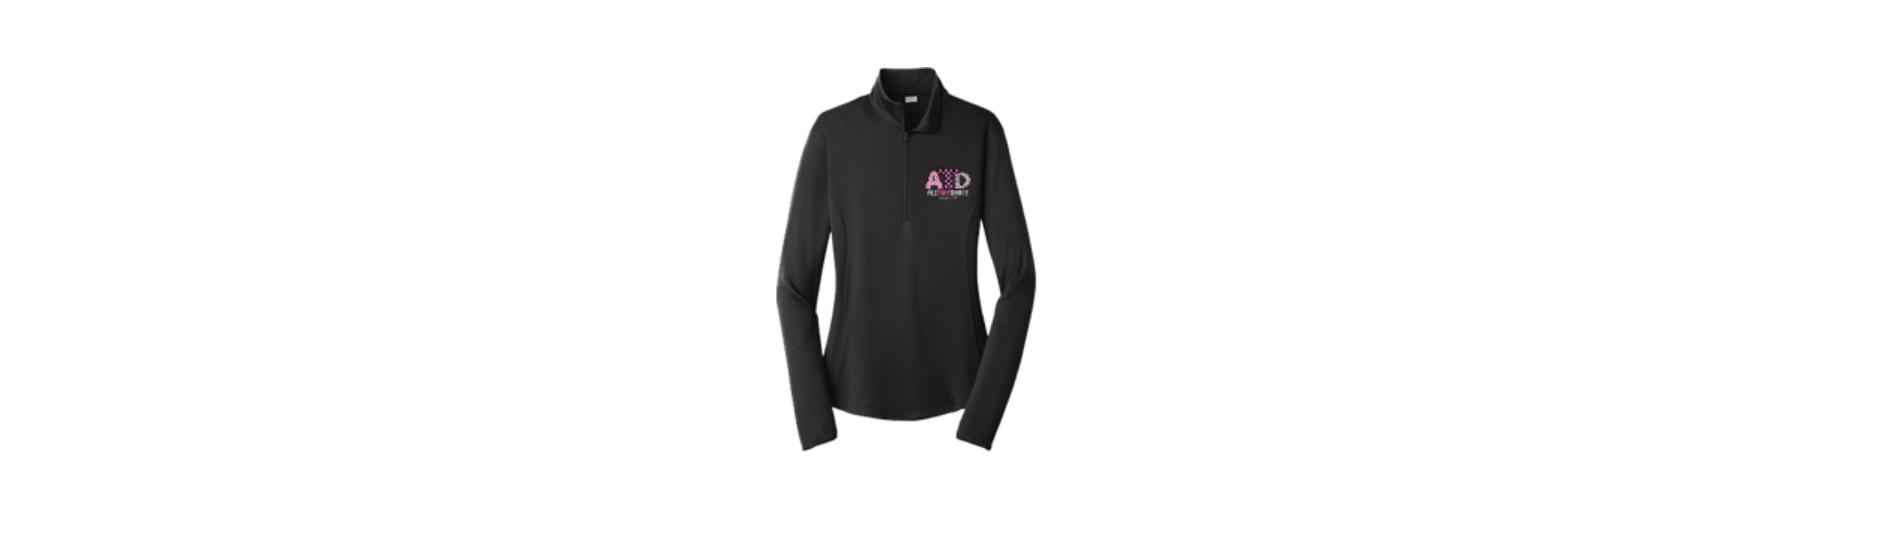 5e4ece534f198 ATD Polka Dot Chevron 1/4 Zip Fitness Jacket — Spirited by Design